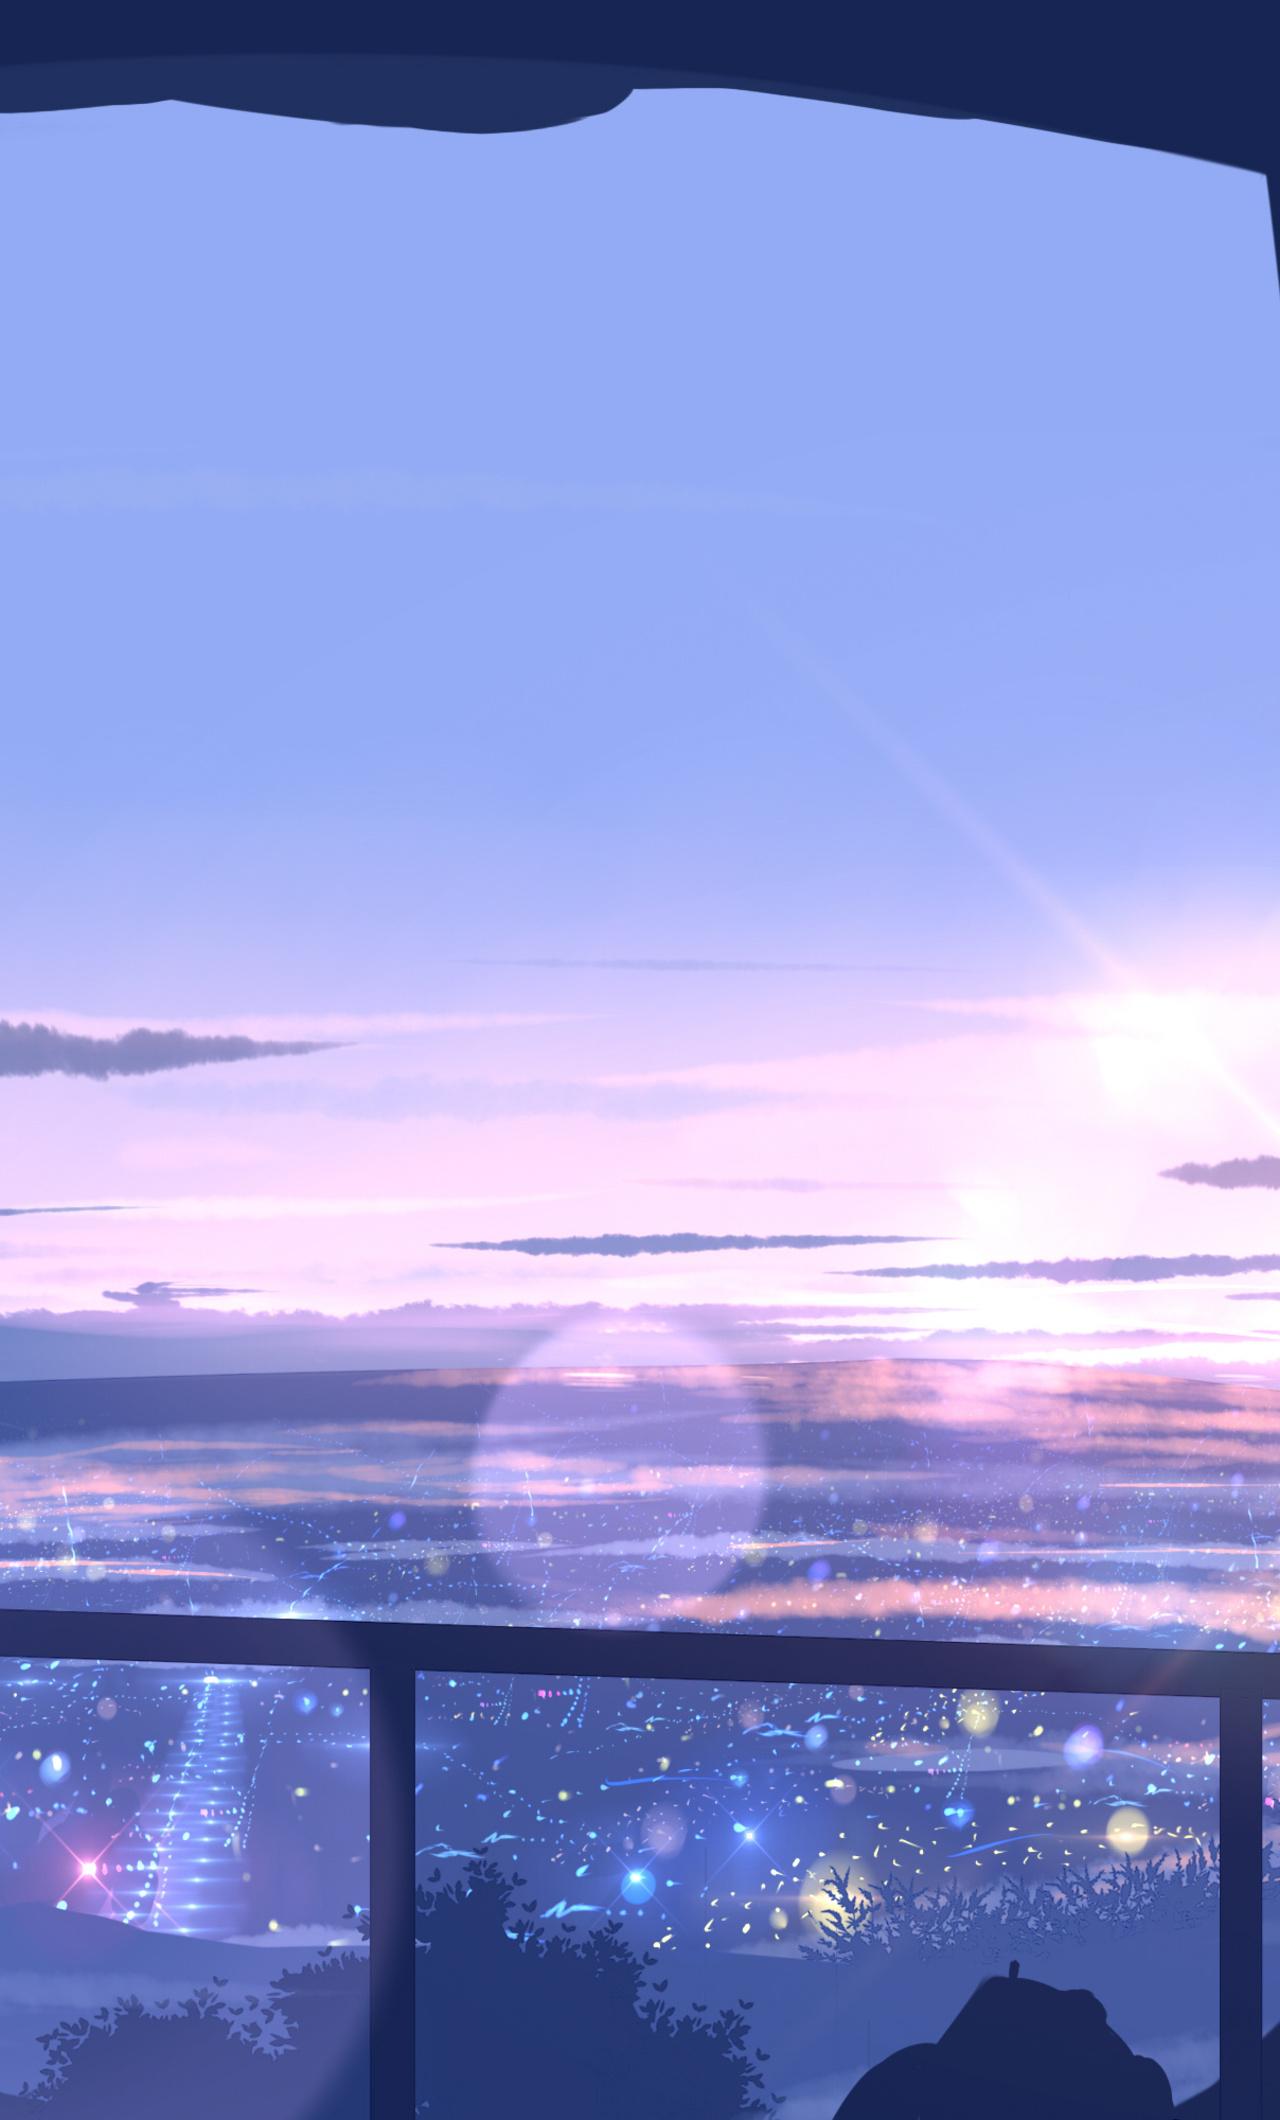 1280x2120 Scenery View From Window Anime 4k Iphone 6 Hd 4k